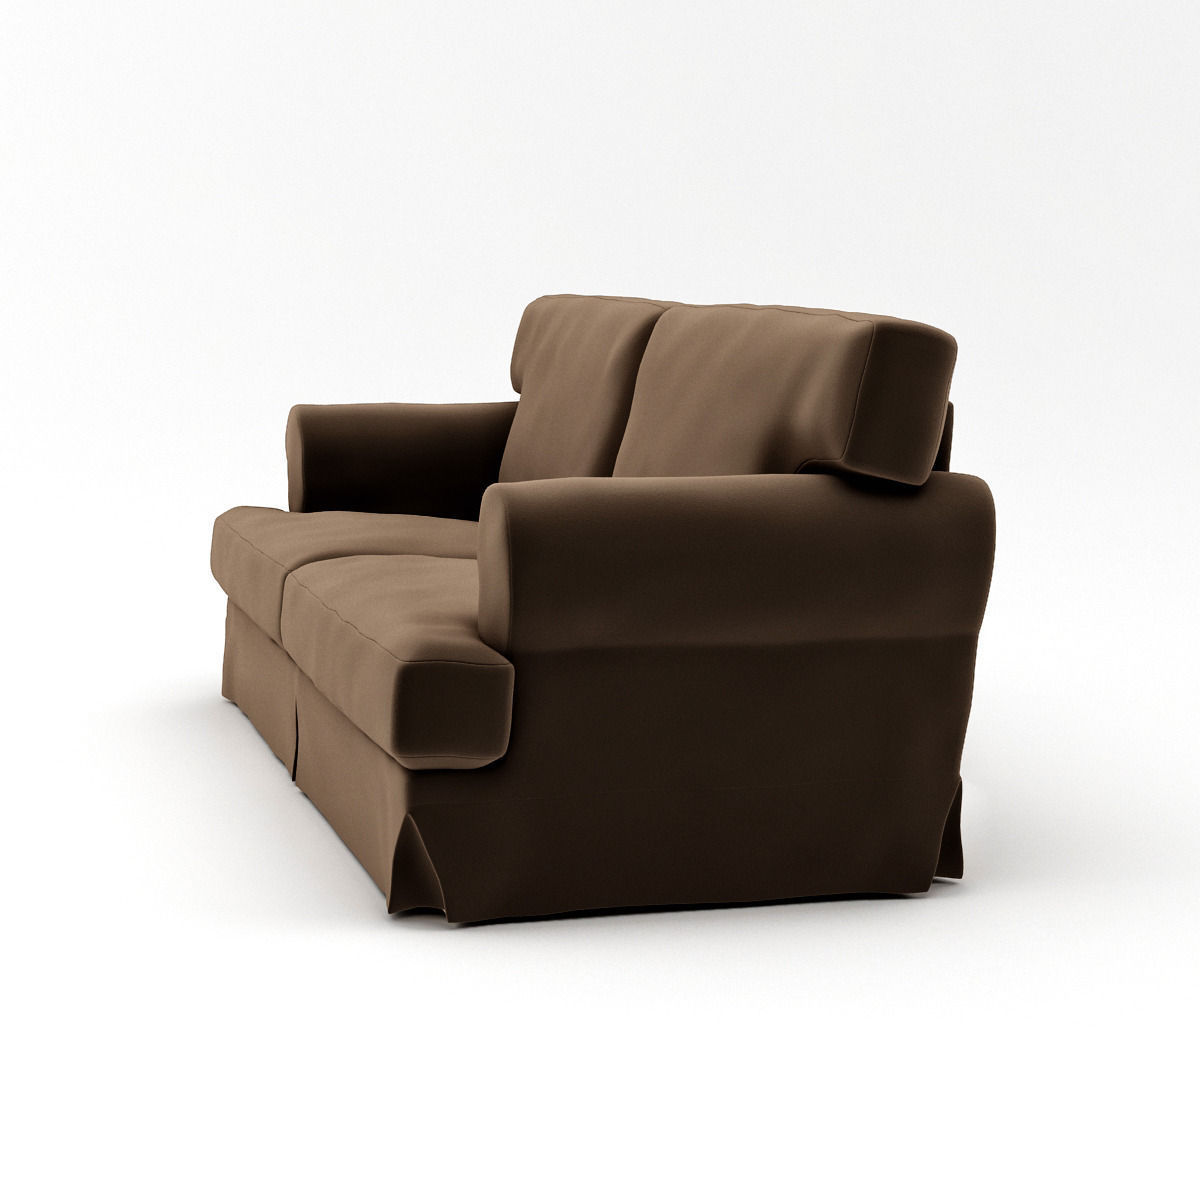 ikea ekeskog sofa for sale billige sofas kaufen 3d model max cgtrader